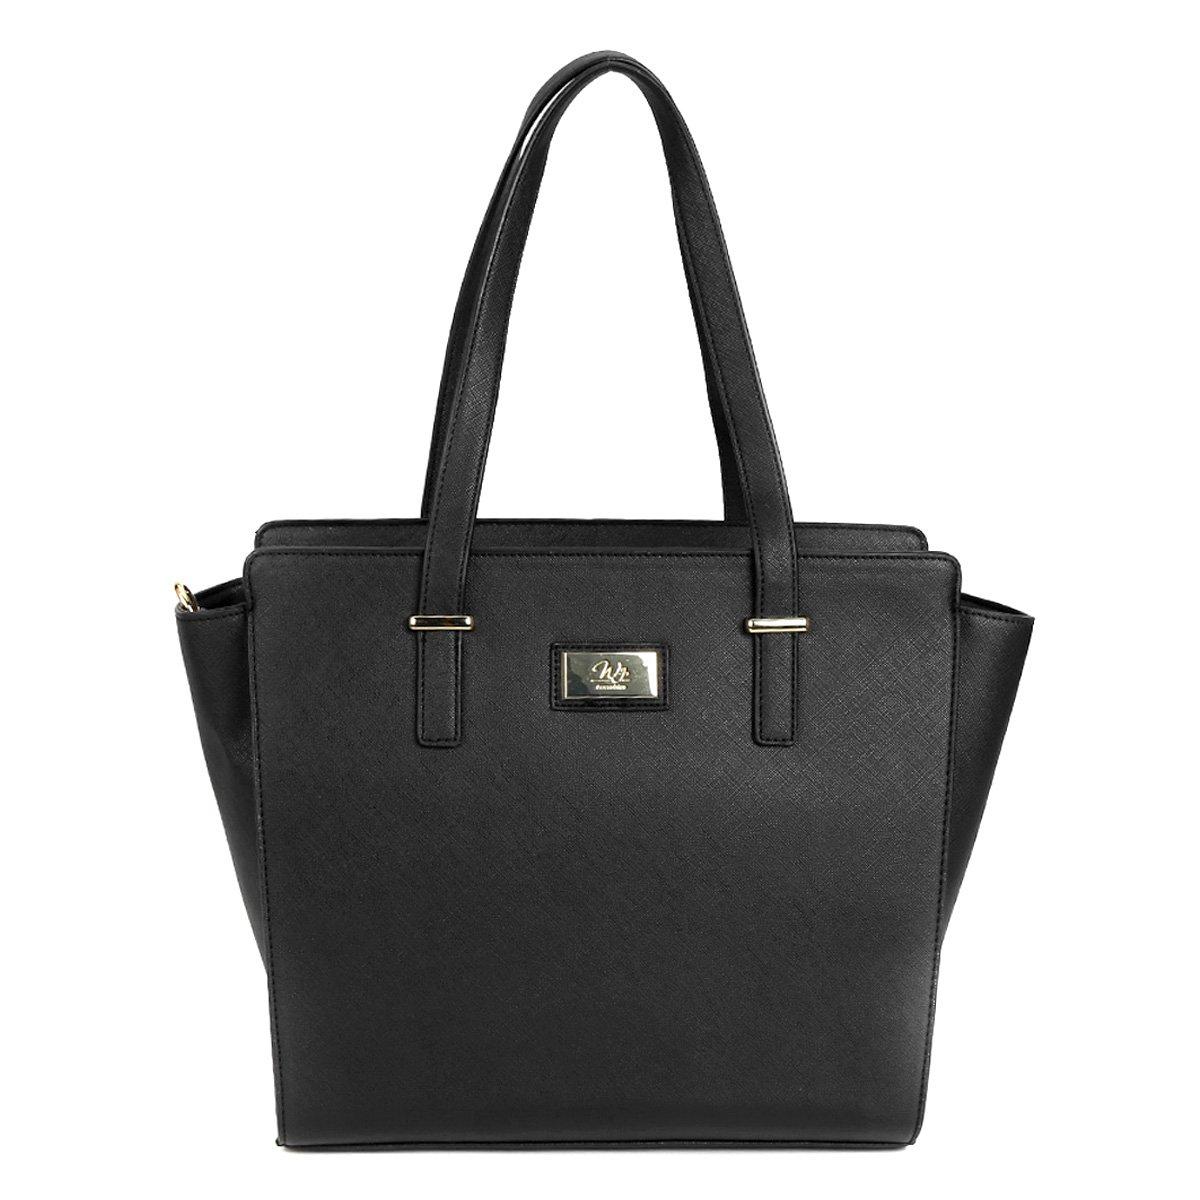 eade40d91 Bolsa WJ Shopper Básica Logo - Compre Agora | Zattini